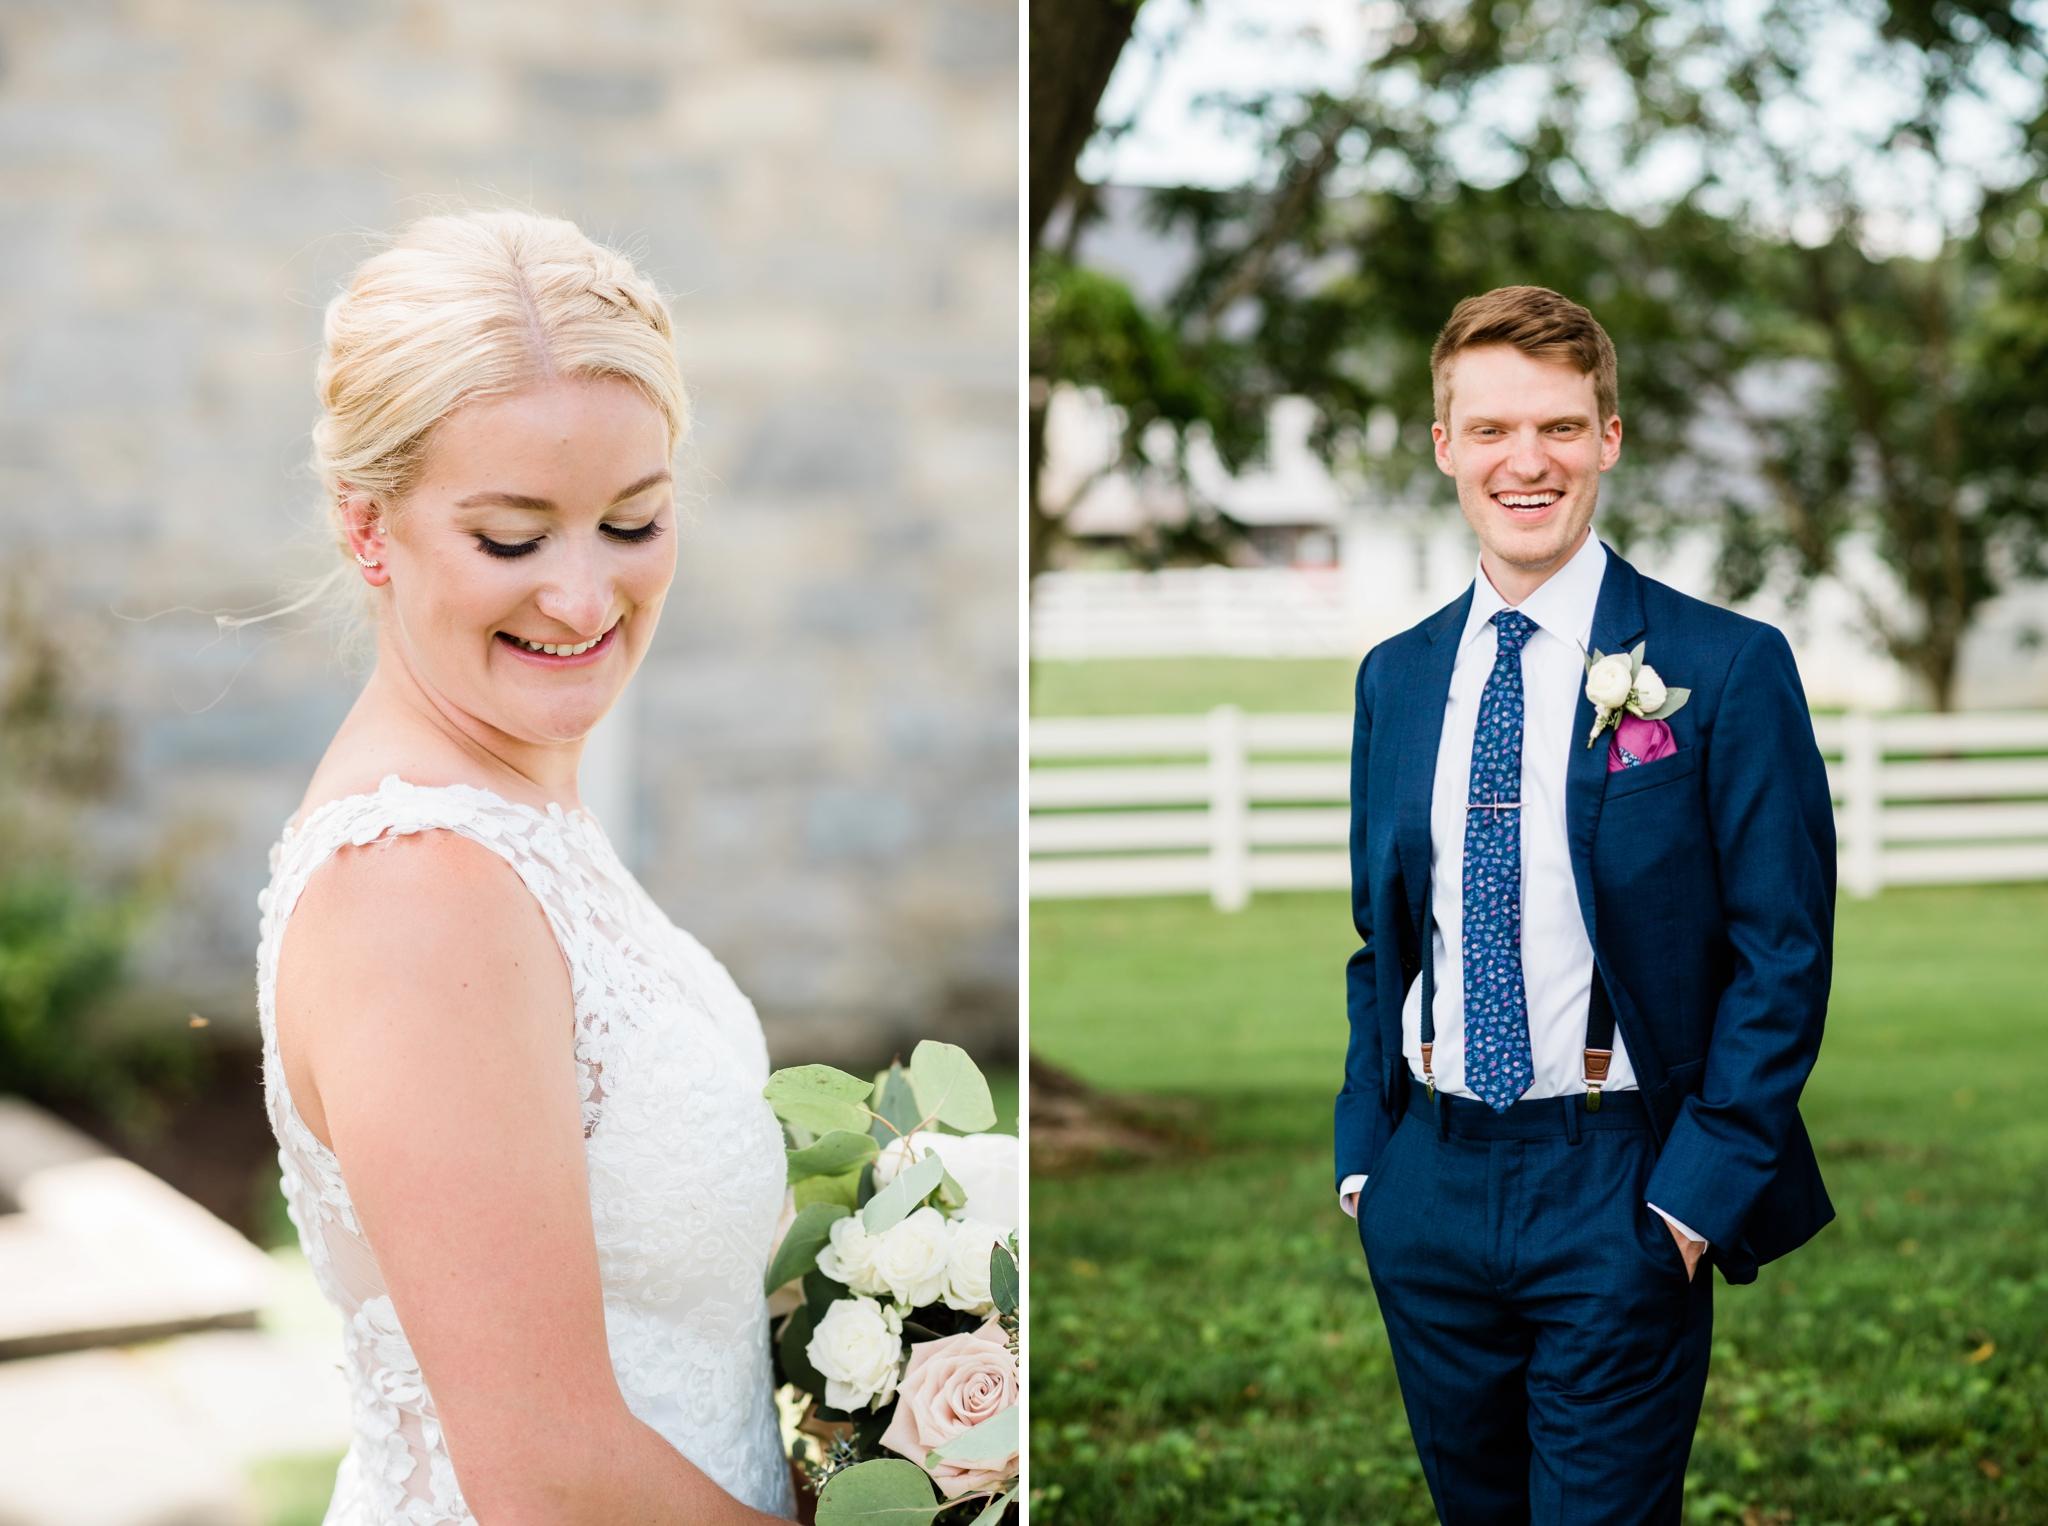 Emily Grace Photography, Lancaster PA Wedding Photographer, Wedding Photography for Unique Couples, The Barn at Silverstone, Lancaster PA Wedding Venue, Central PA Wedding Photographer